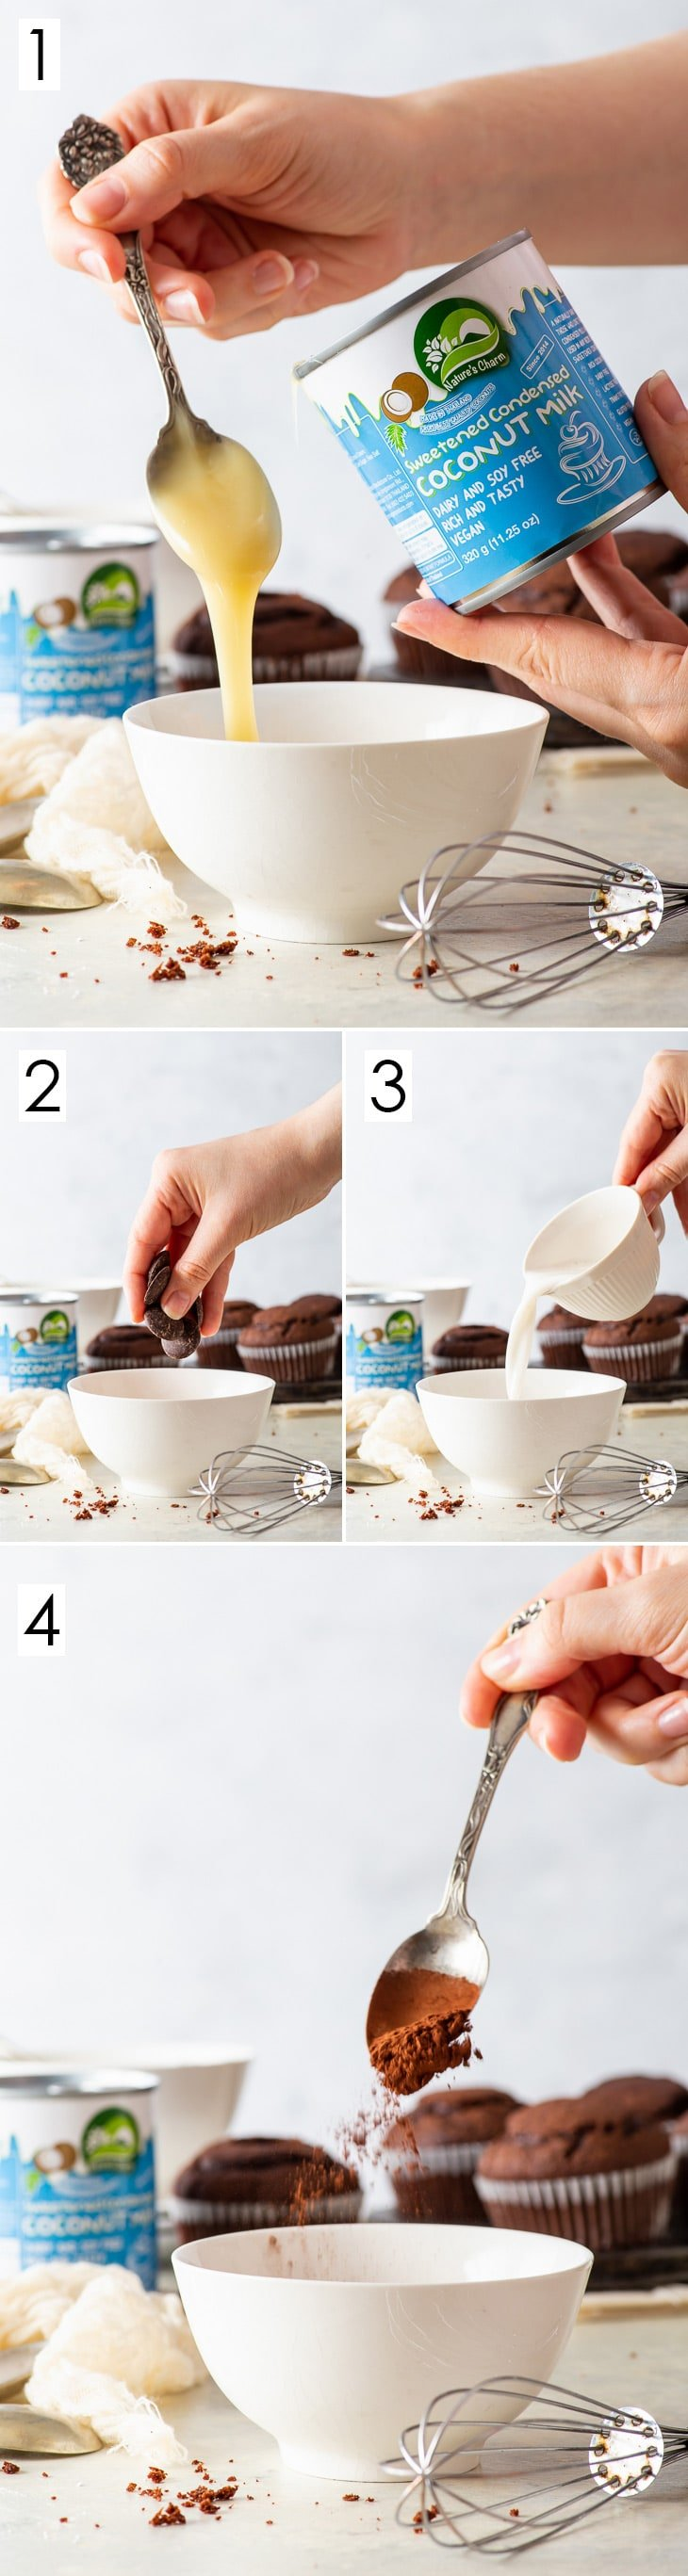 4 step process of making vegan chocolate fudge sauce.